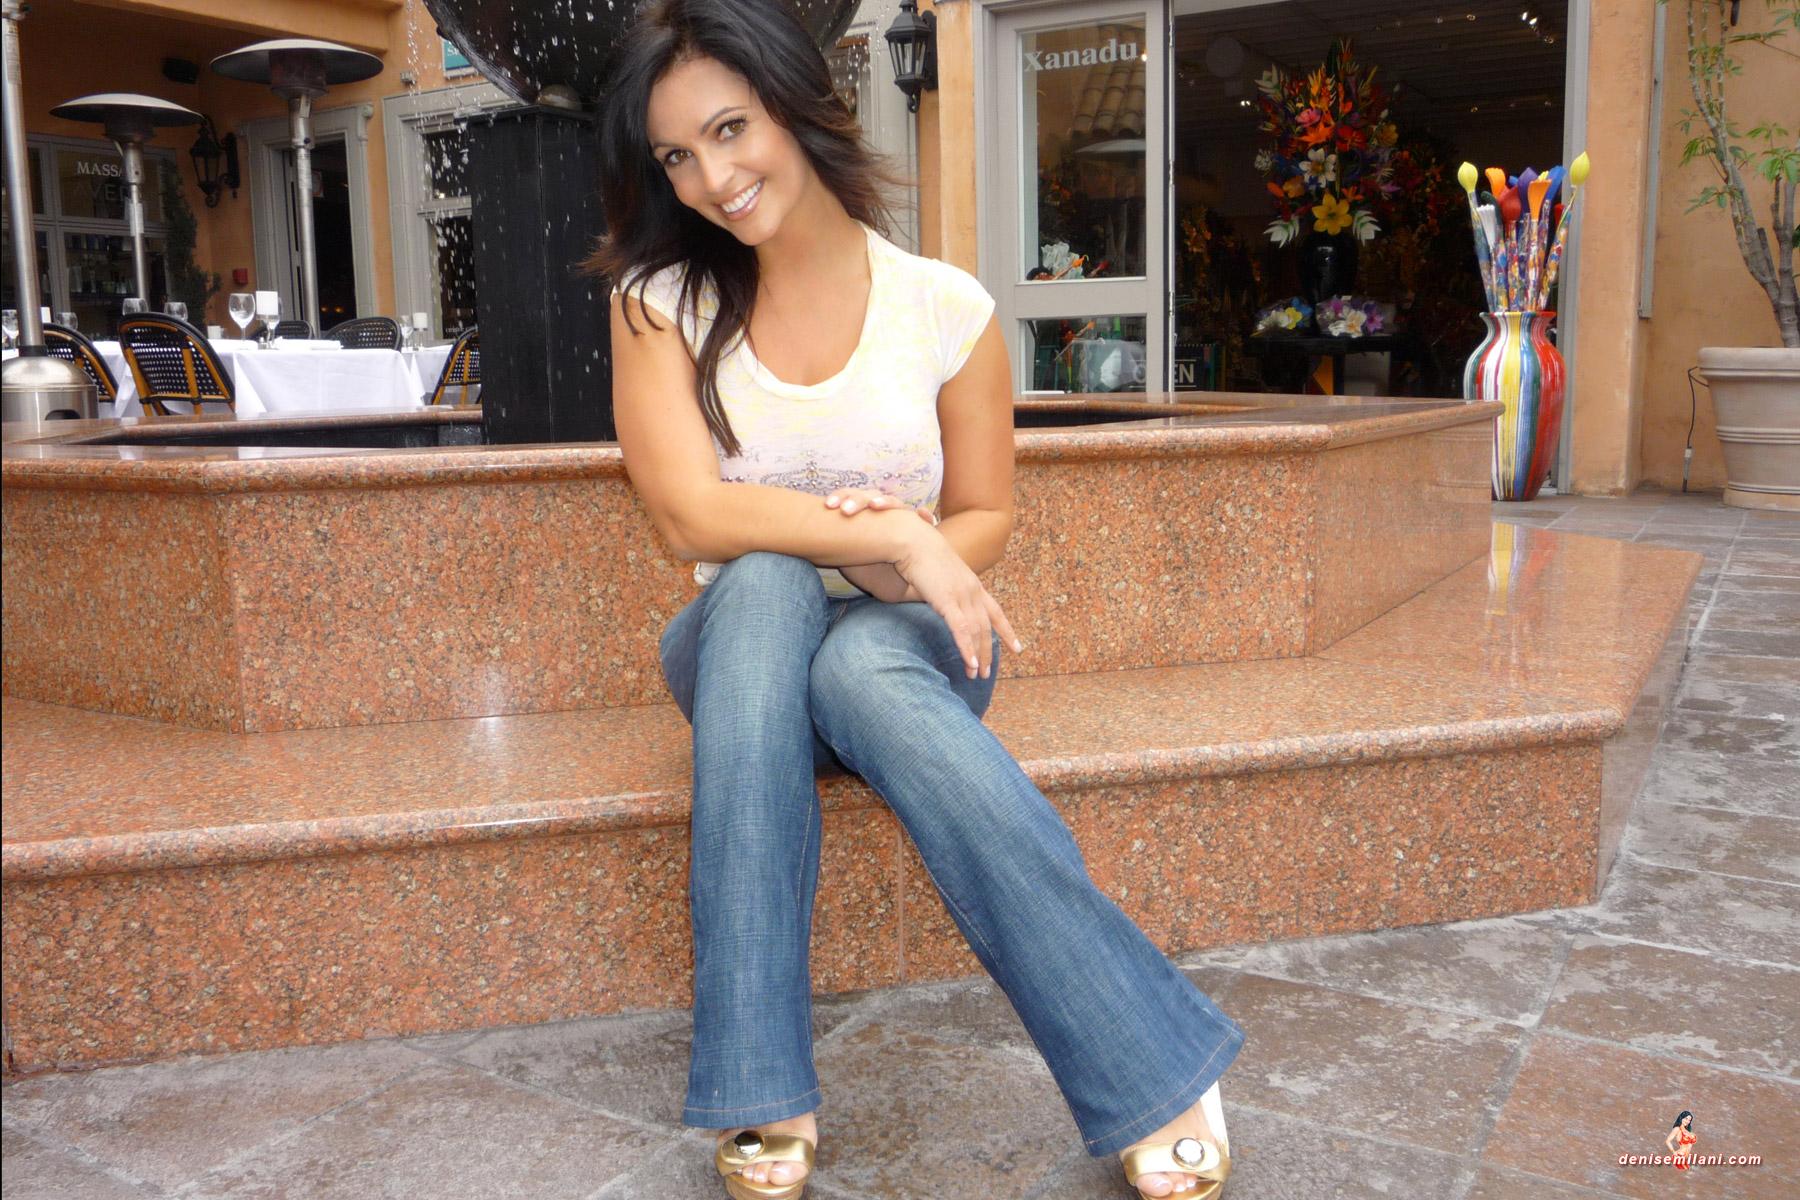 Denise Milani Kills In Jeans | planetdenise